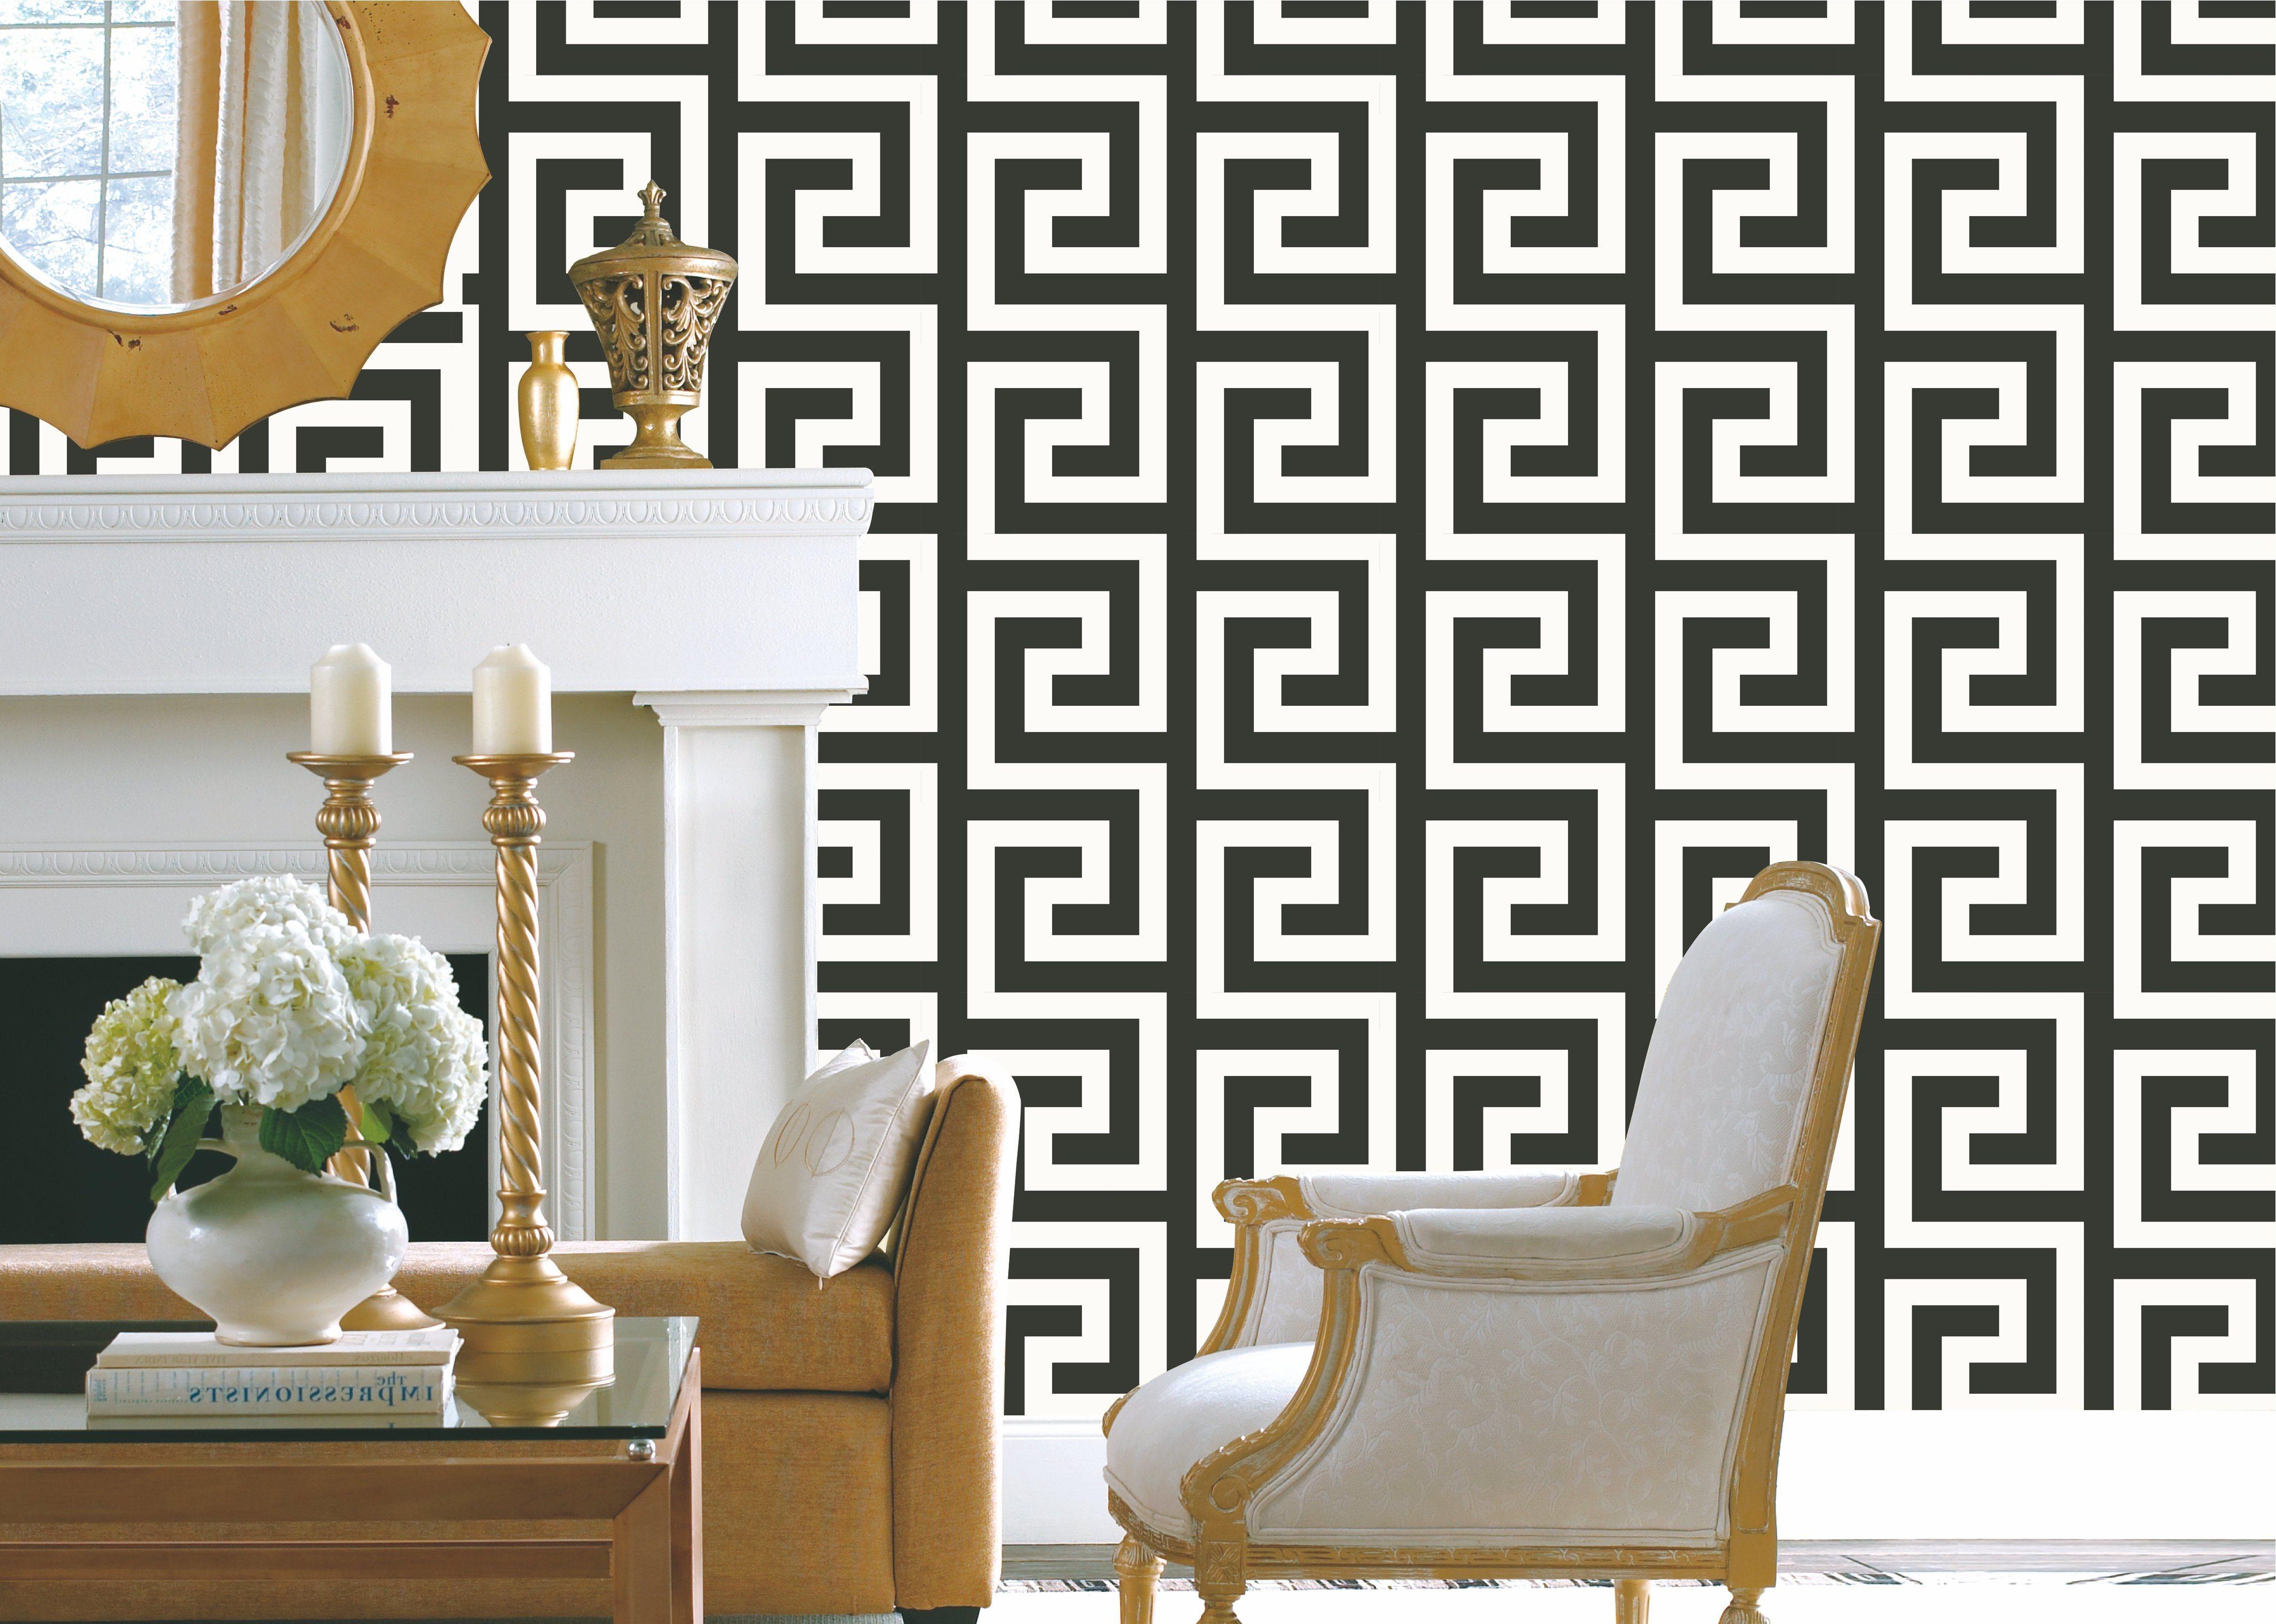 Guangzhou Cheap Price Home Decor Pvc Vinyl Waterproof - Wall Paper Design Living Room India - HD Wallpaper